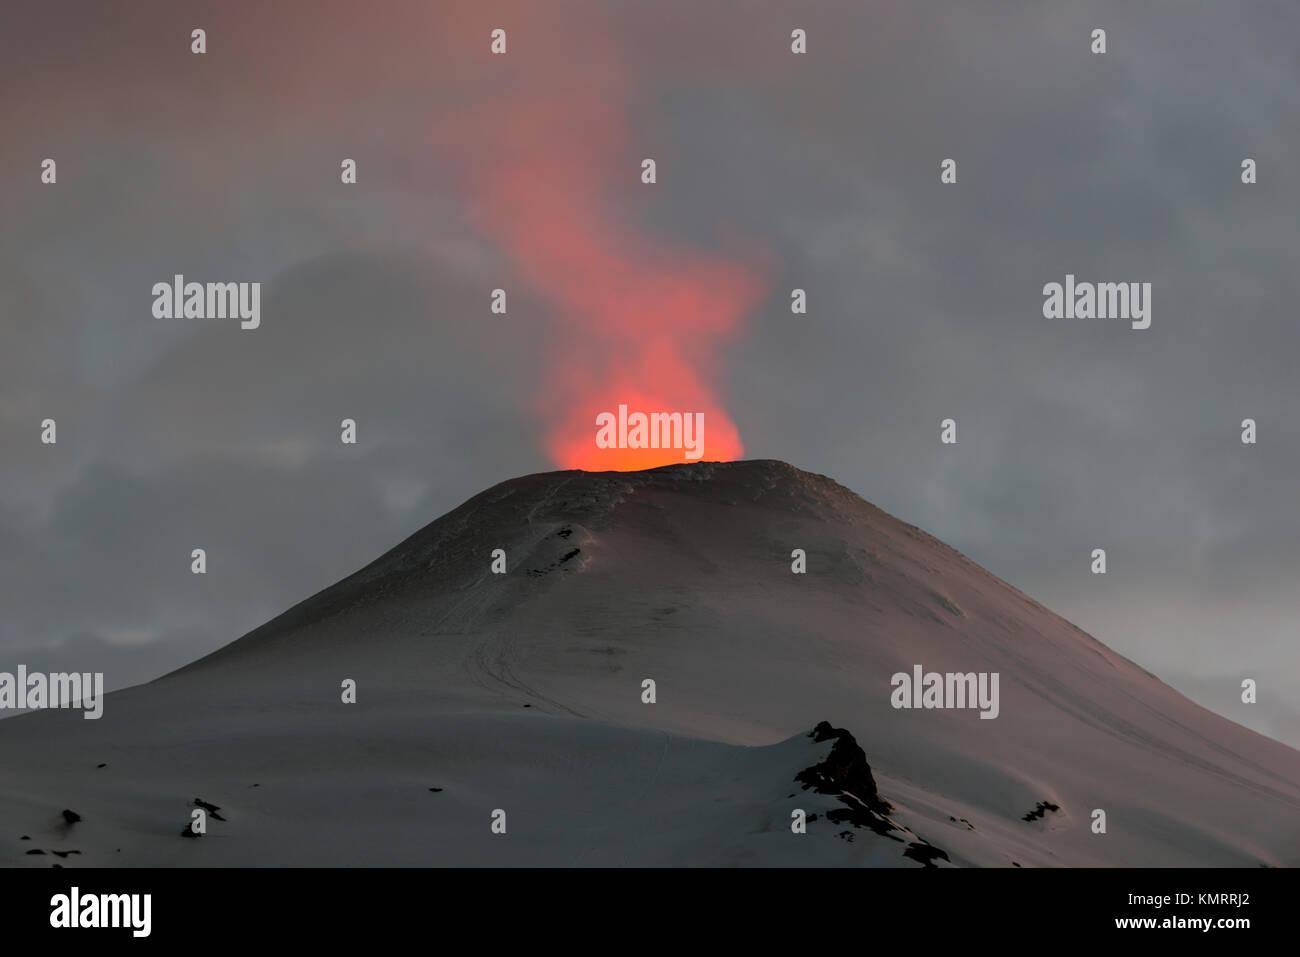 Volcán Villarrica / Villarrica volcano. Araucania, Chile. - Stock Image